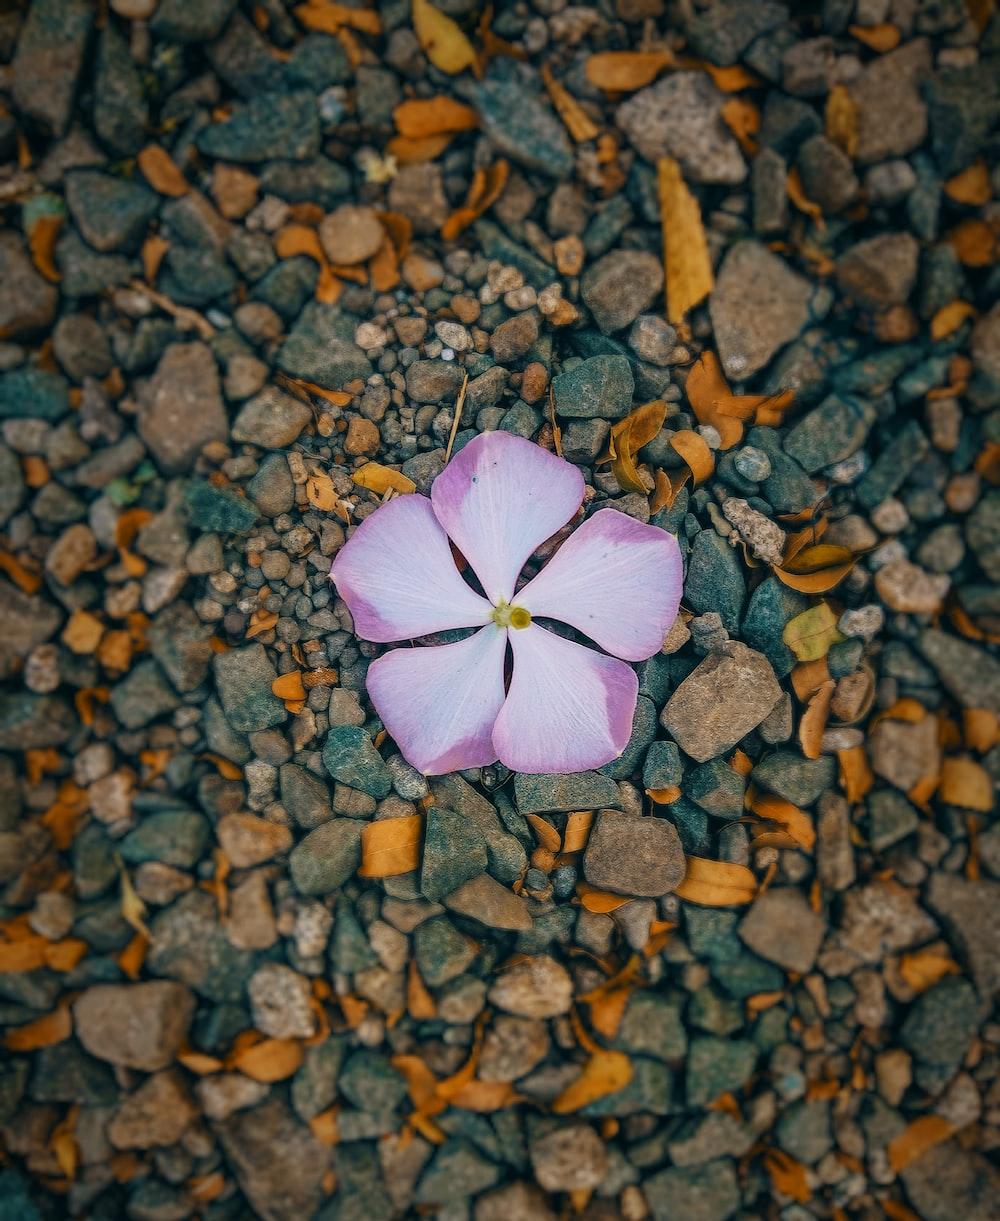 macro photography of purple plumeria flower